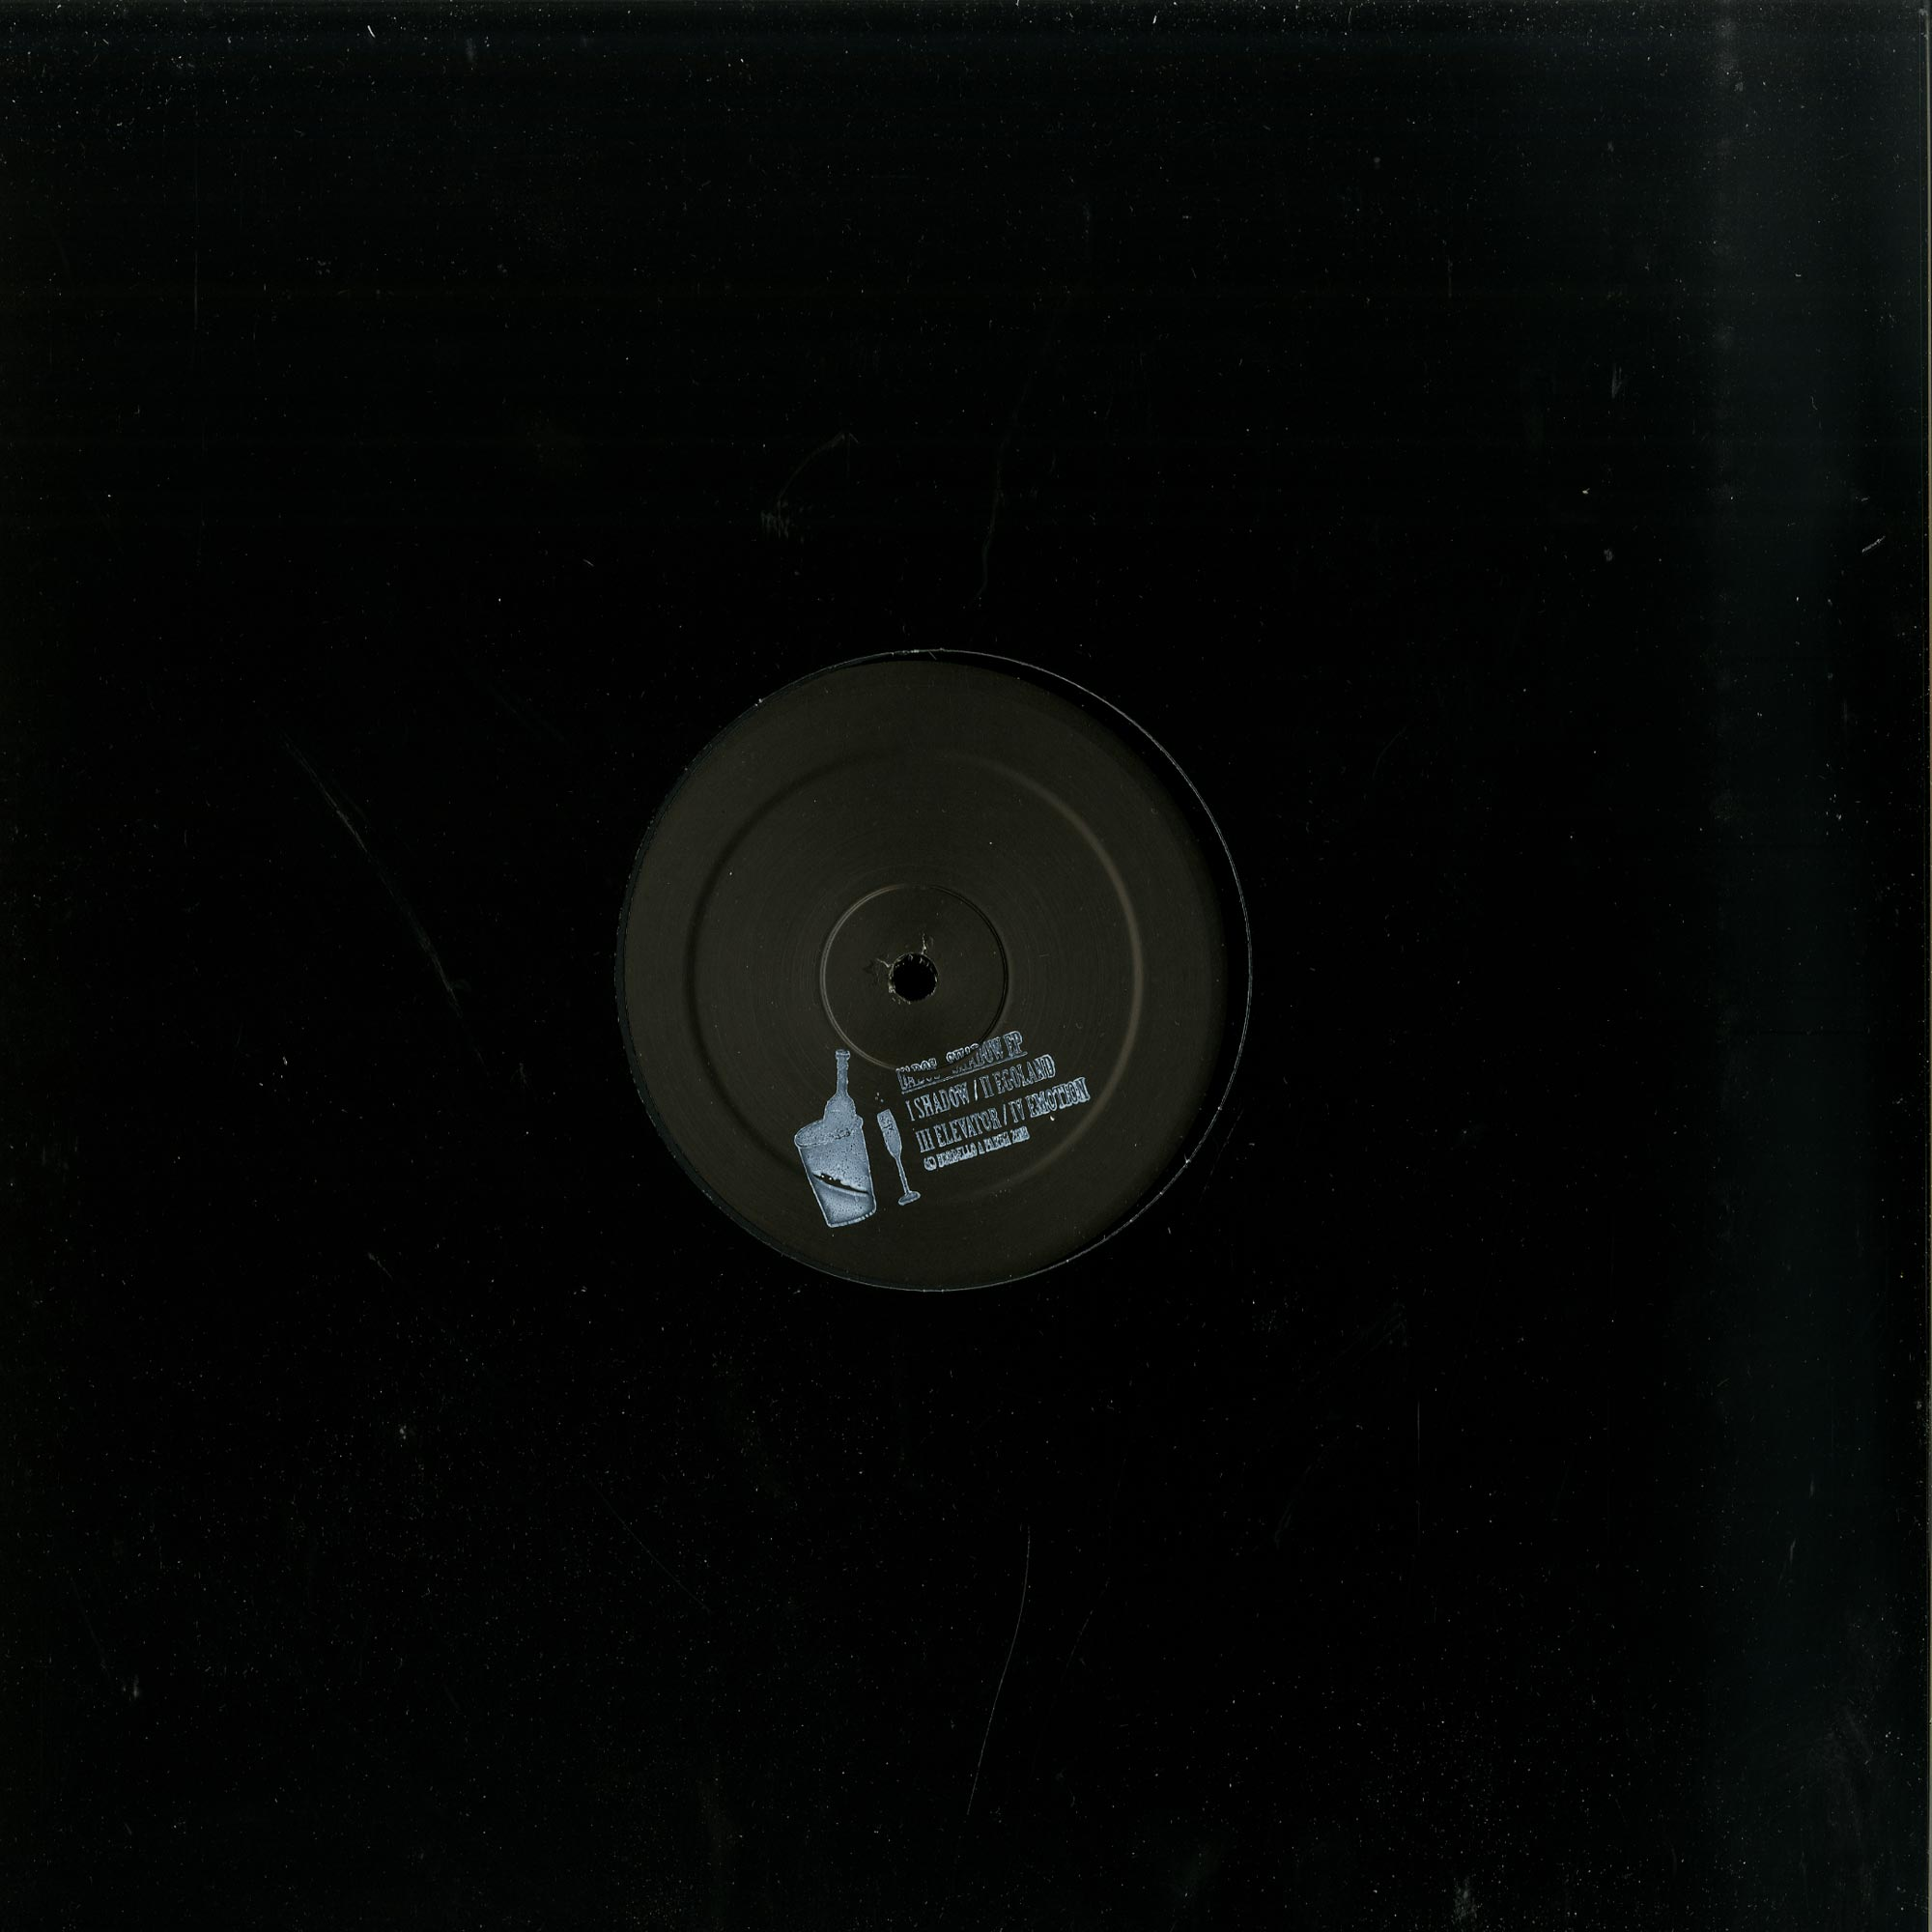 Uabos - SHADOW EP